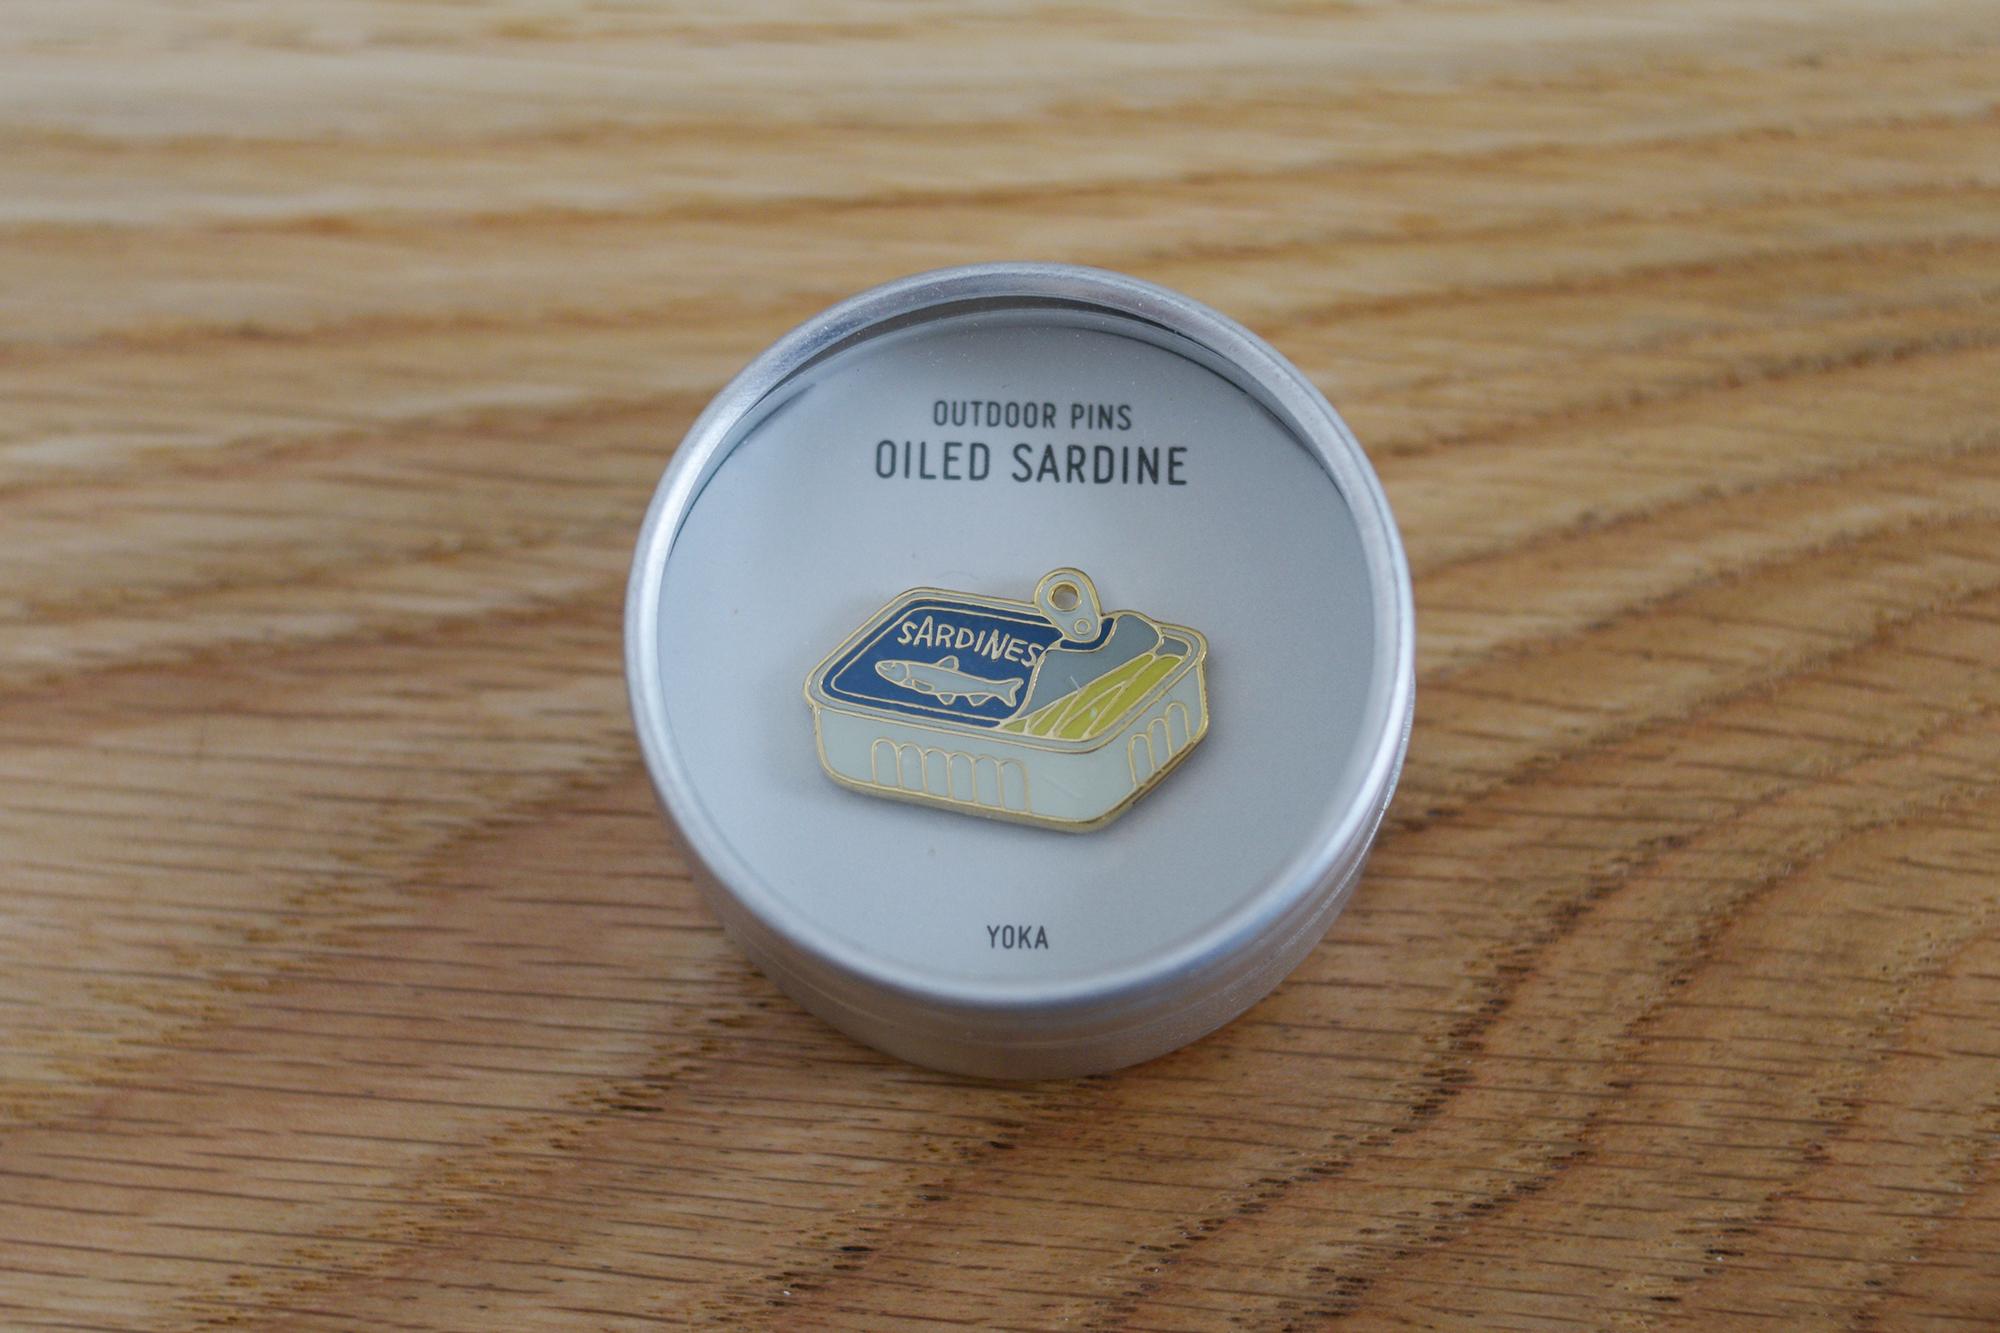 Oiled sardine / YOKA Outdoor Pins